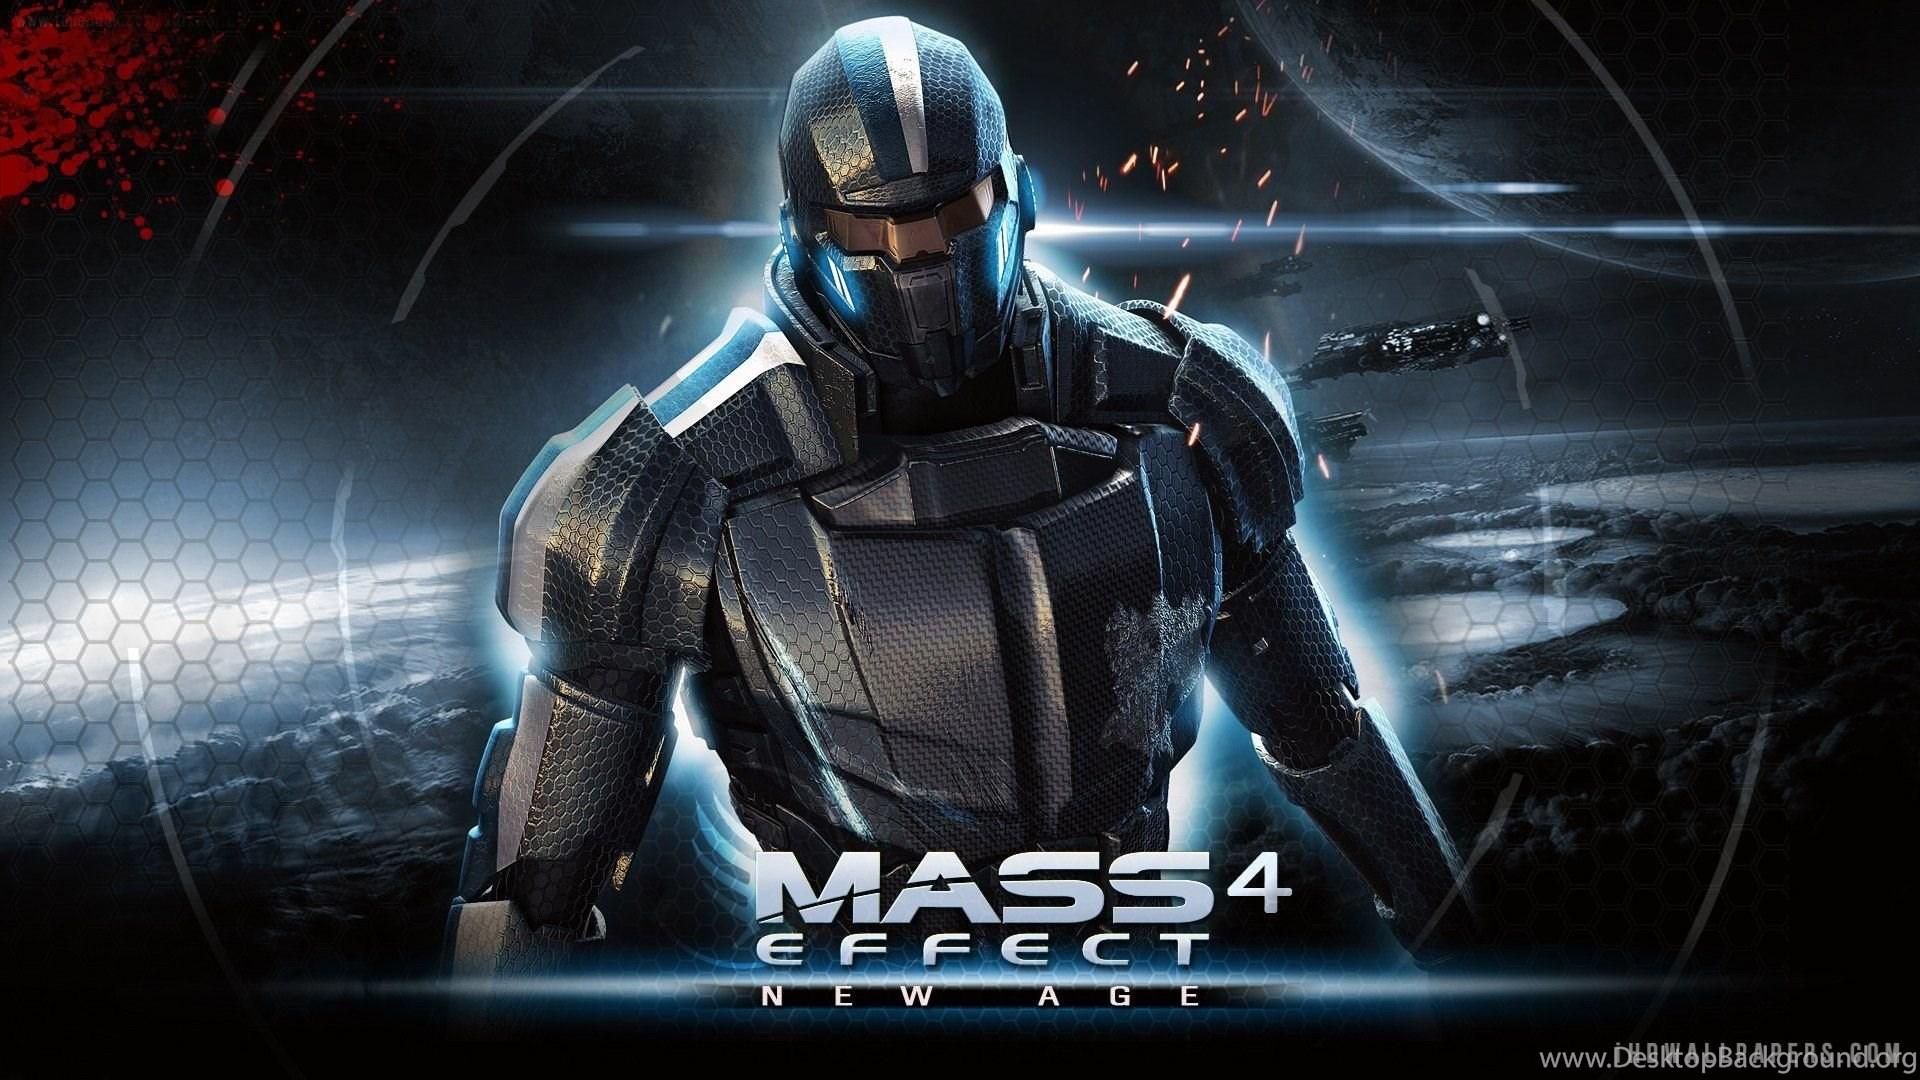 Mass Effect Andromeda Hd Wallpapers Ihd Wallpapers Desktop Background